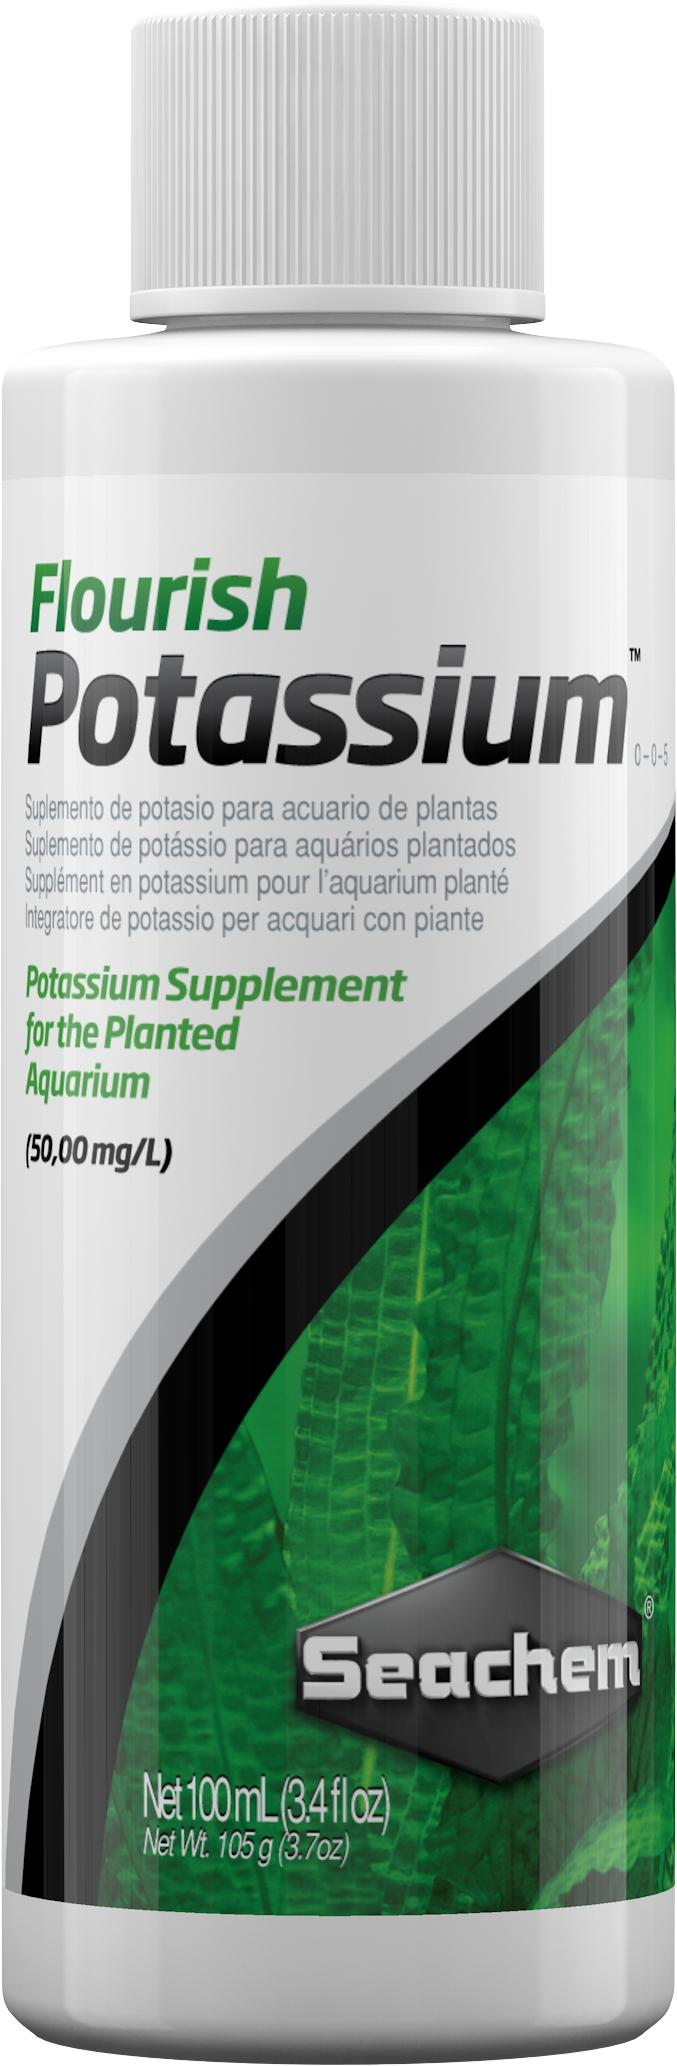 FlourishPotassium-100mL